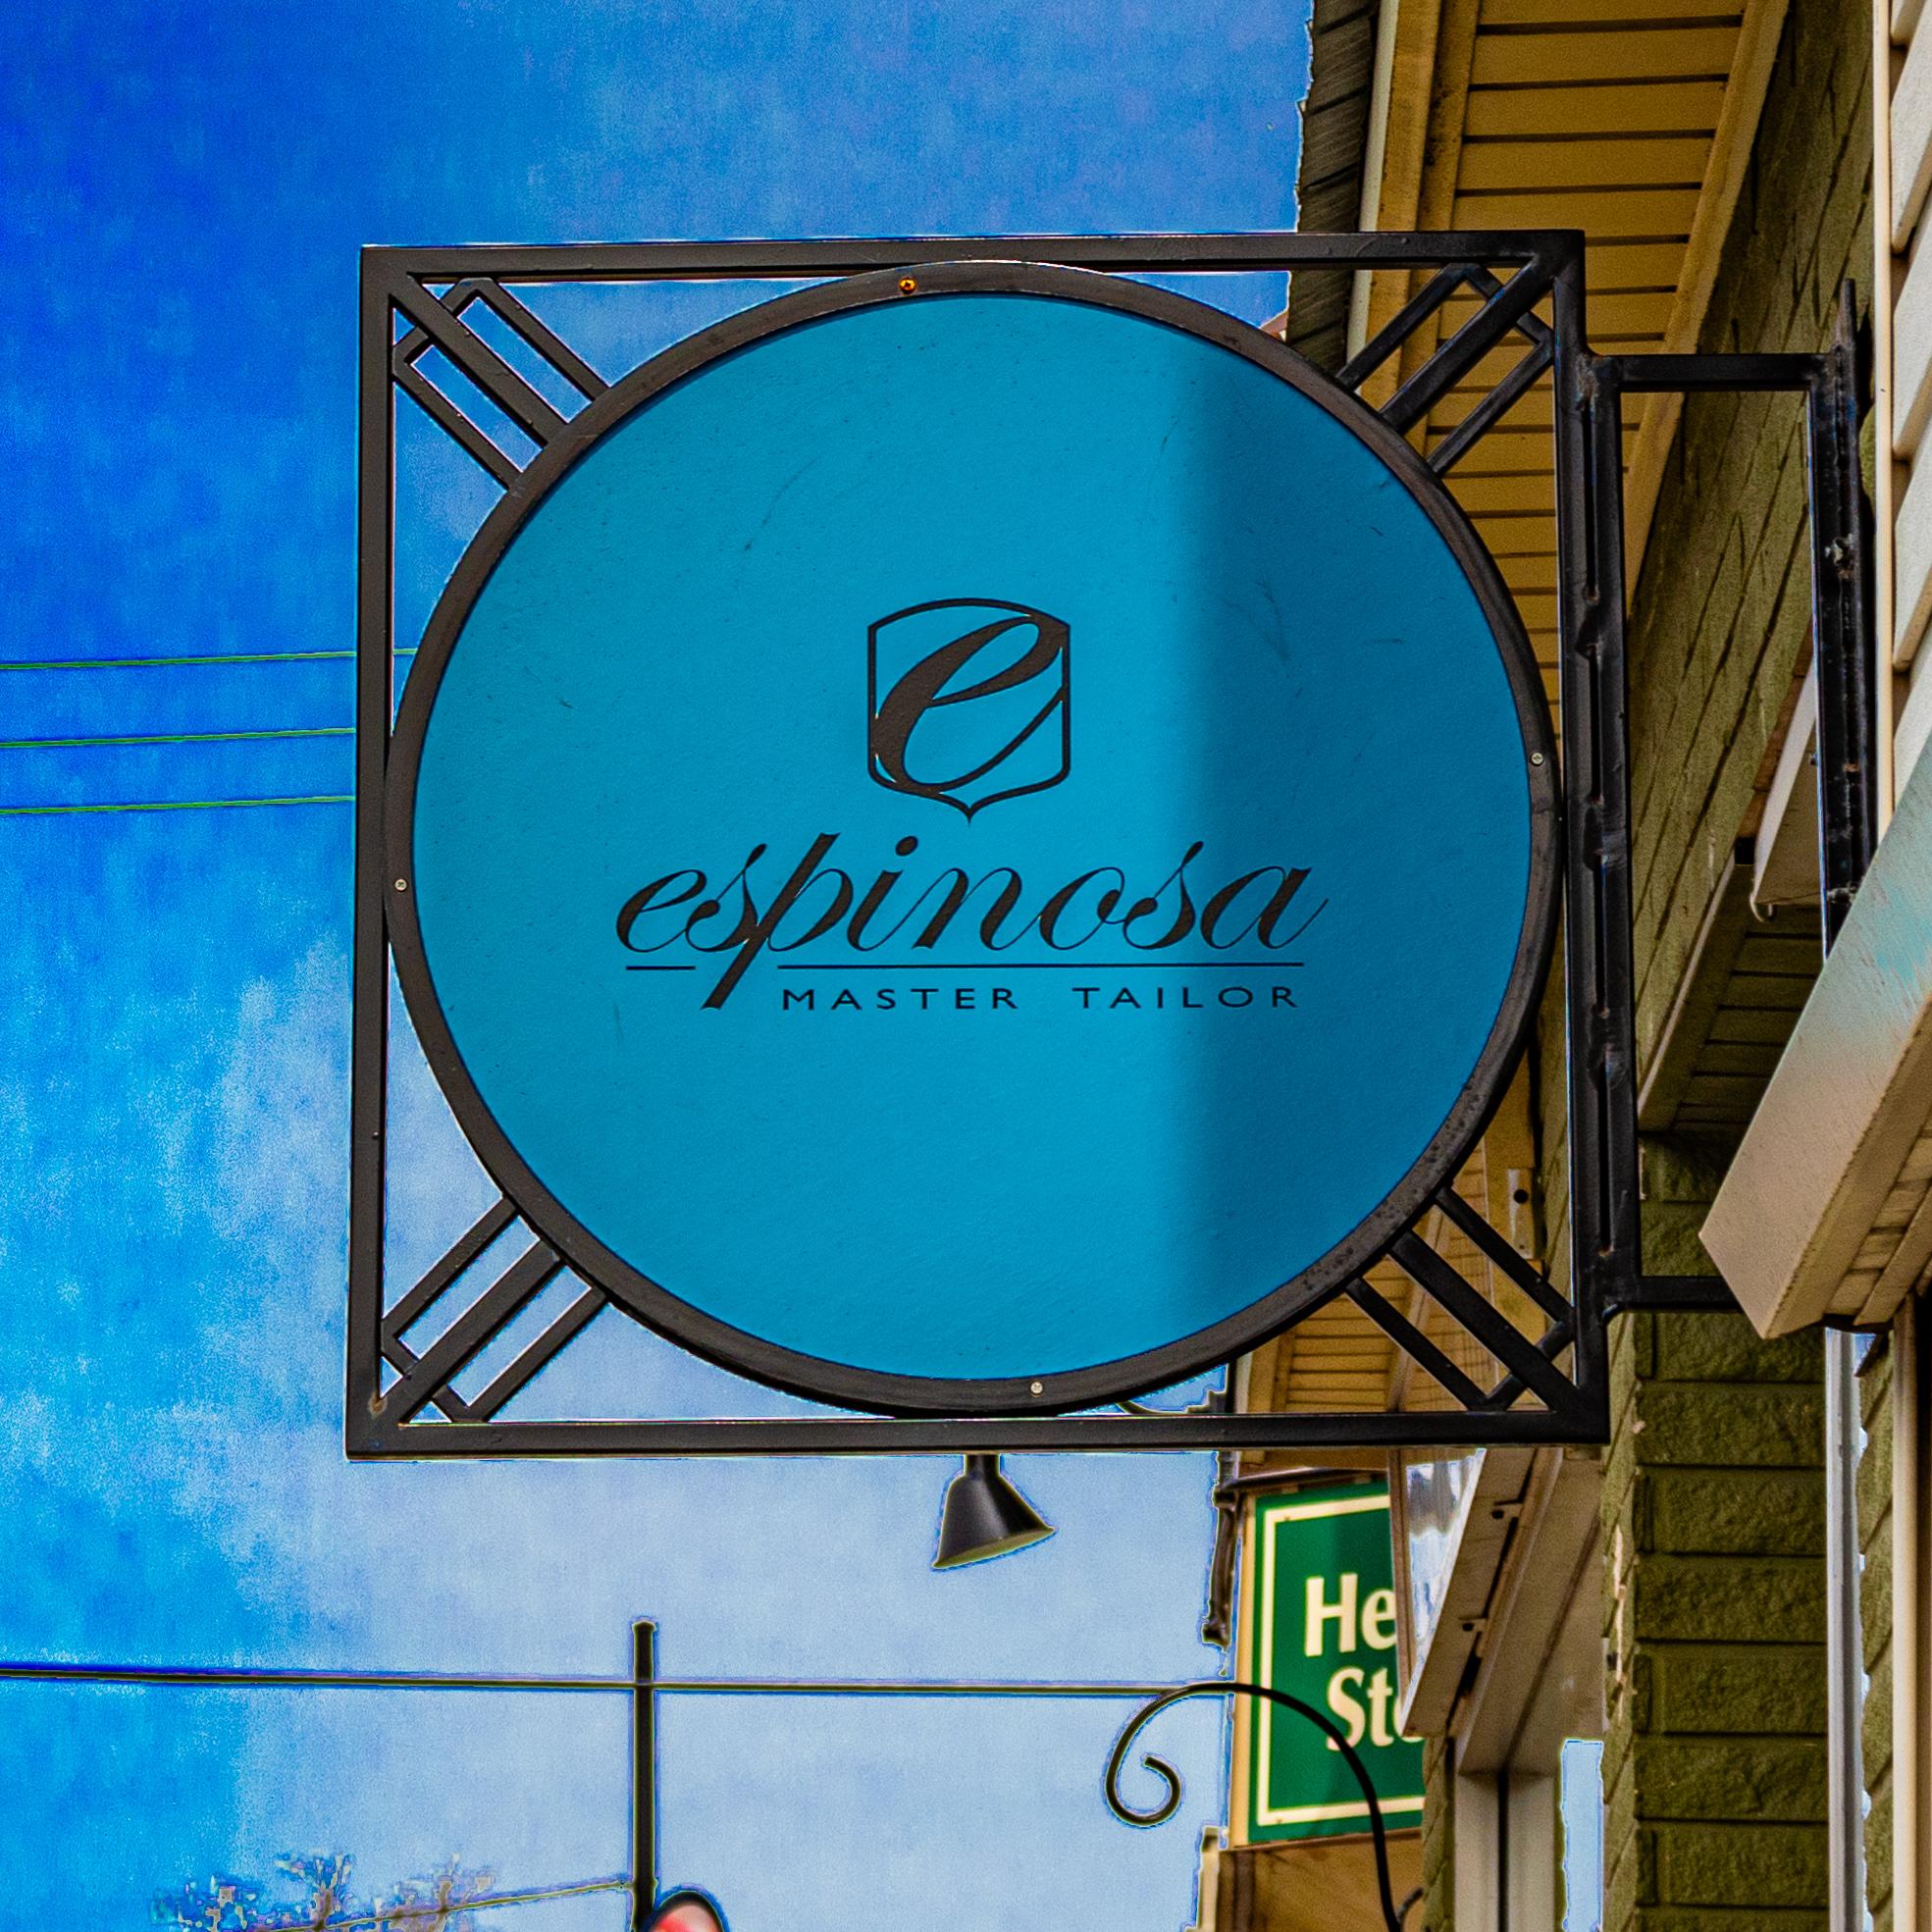 Espinosa Master Tailor